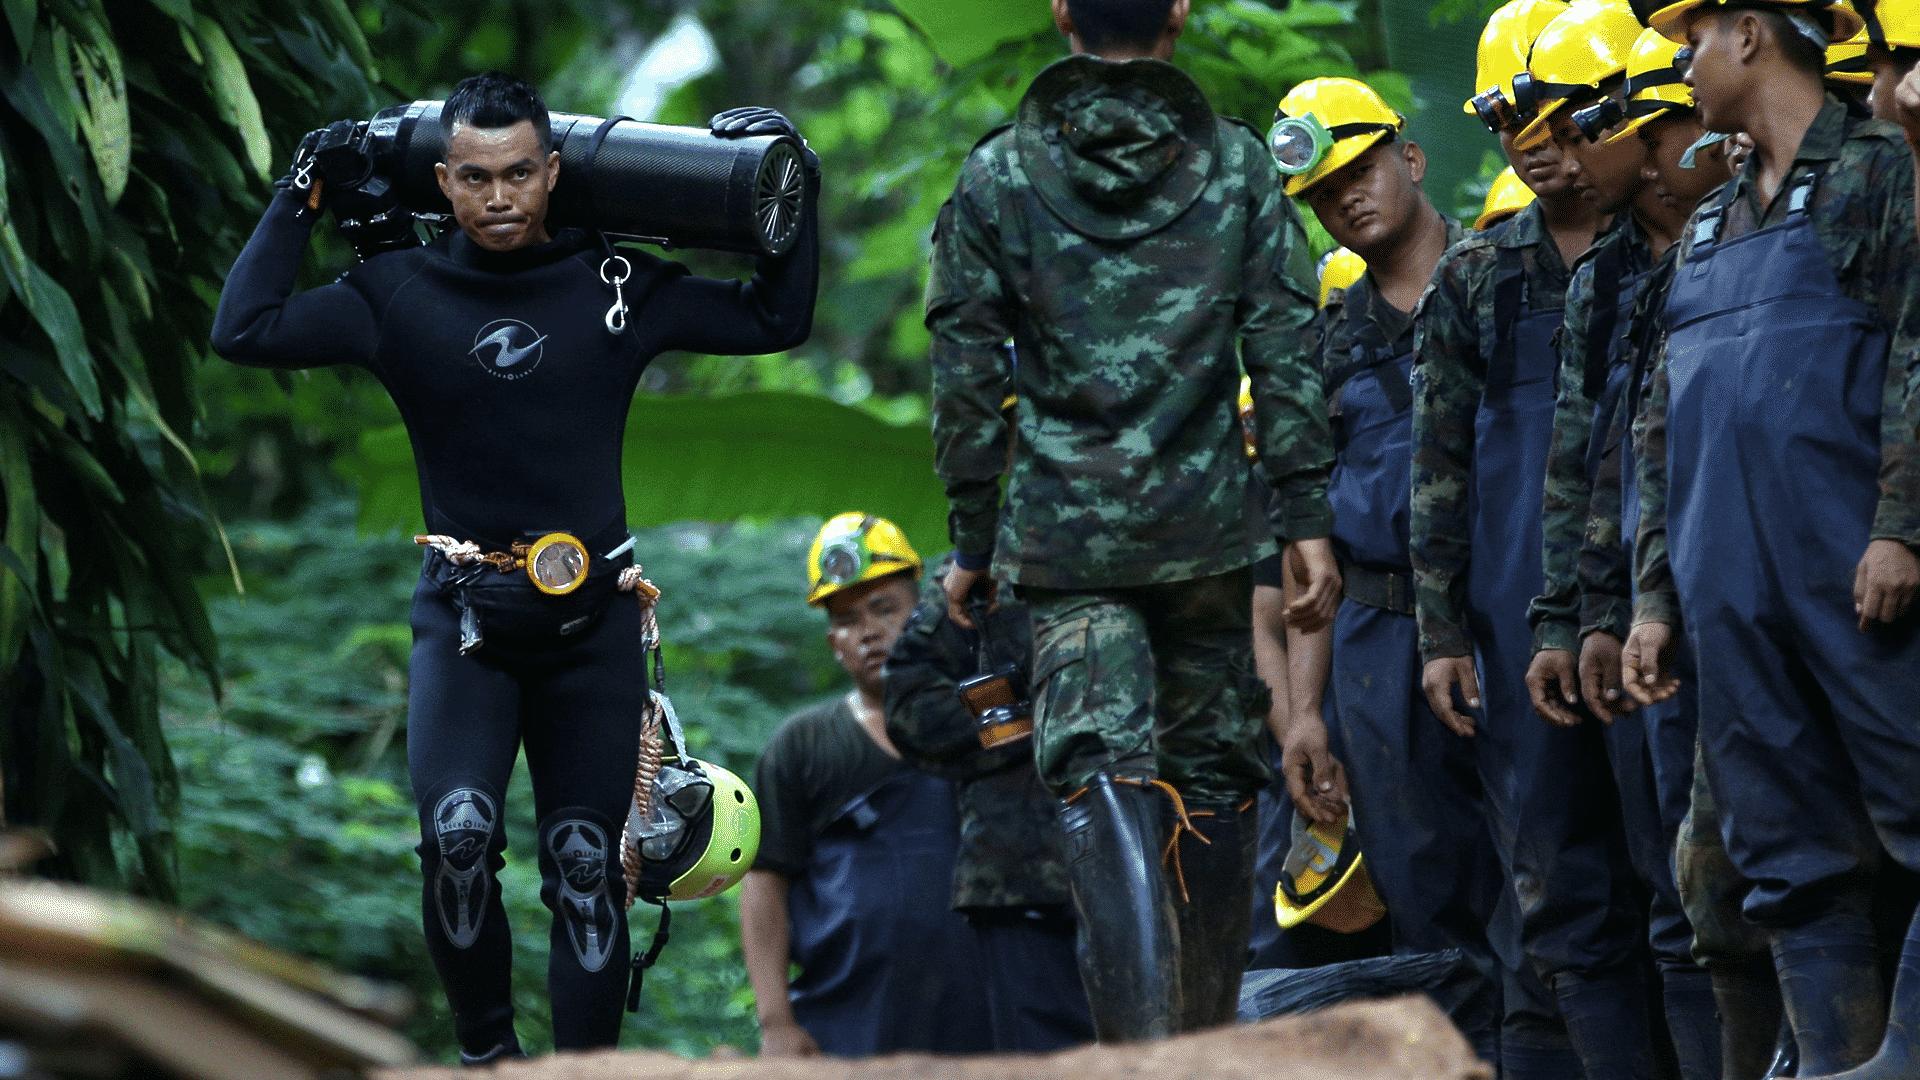 chlapci uväznení v thajskej jaskyni